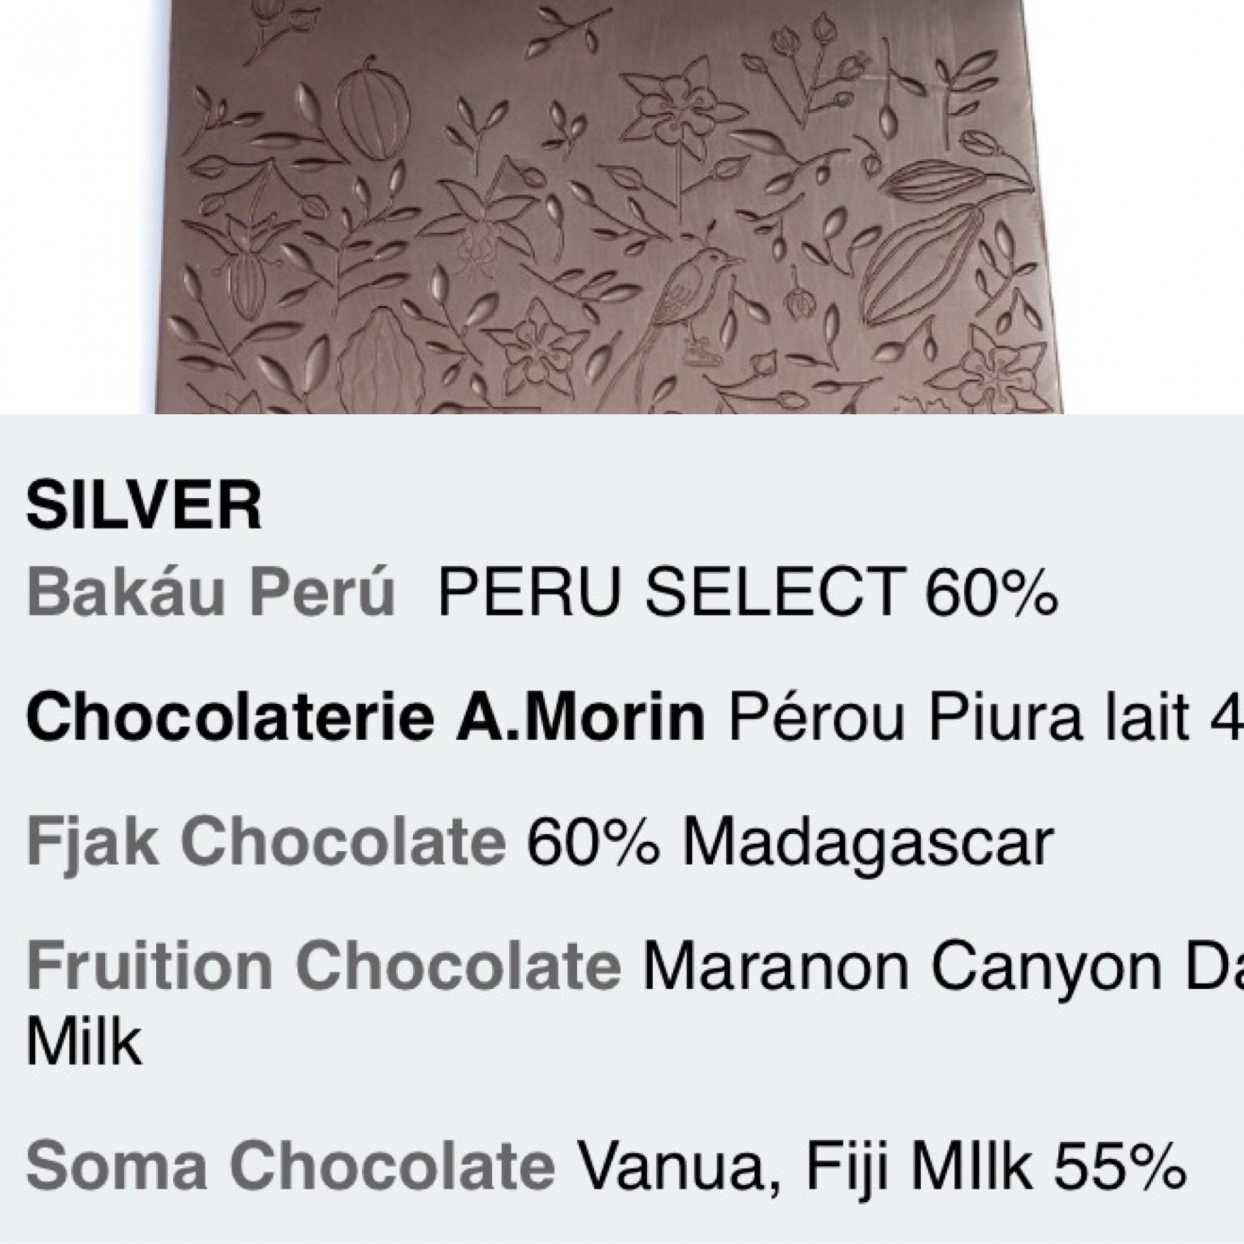 Soma Cacaofiji Vanua Dark Milk awards